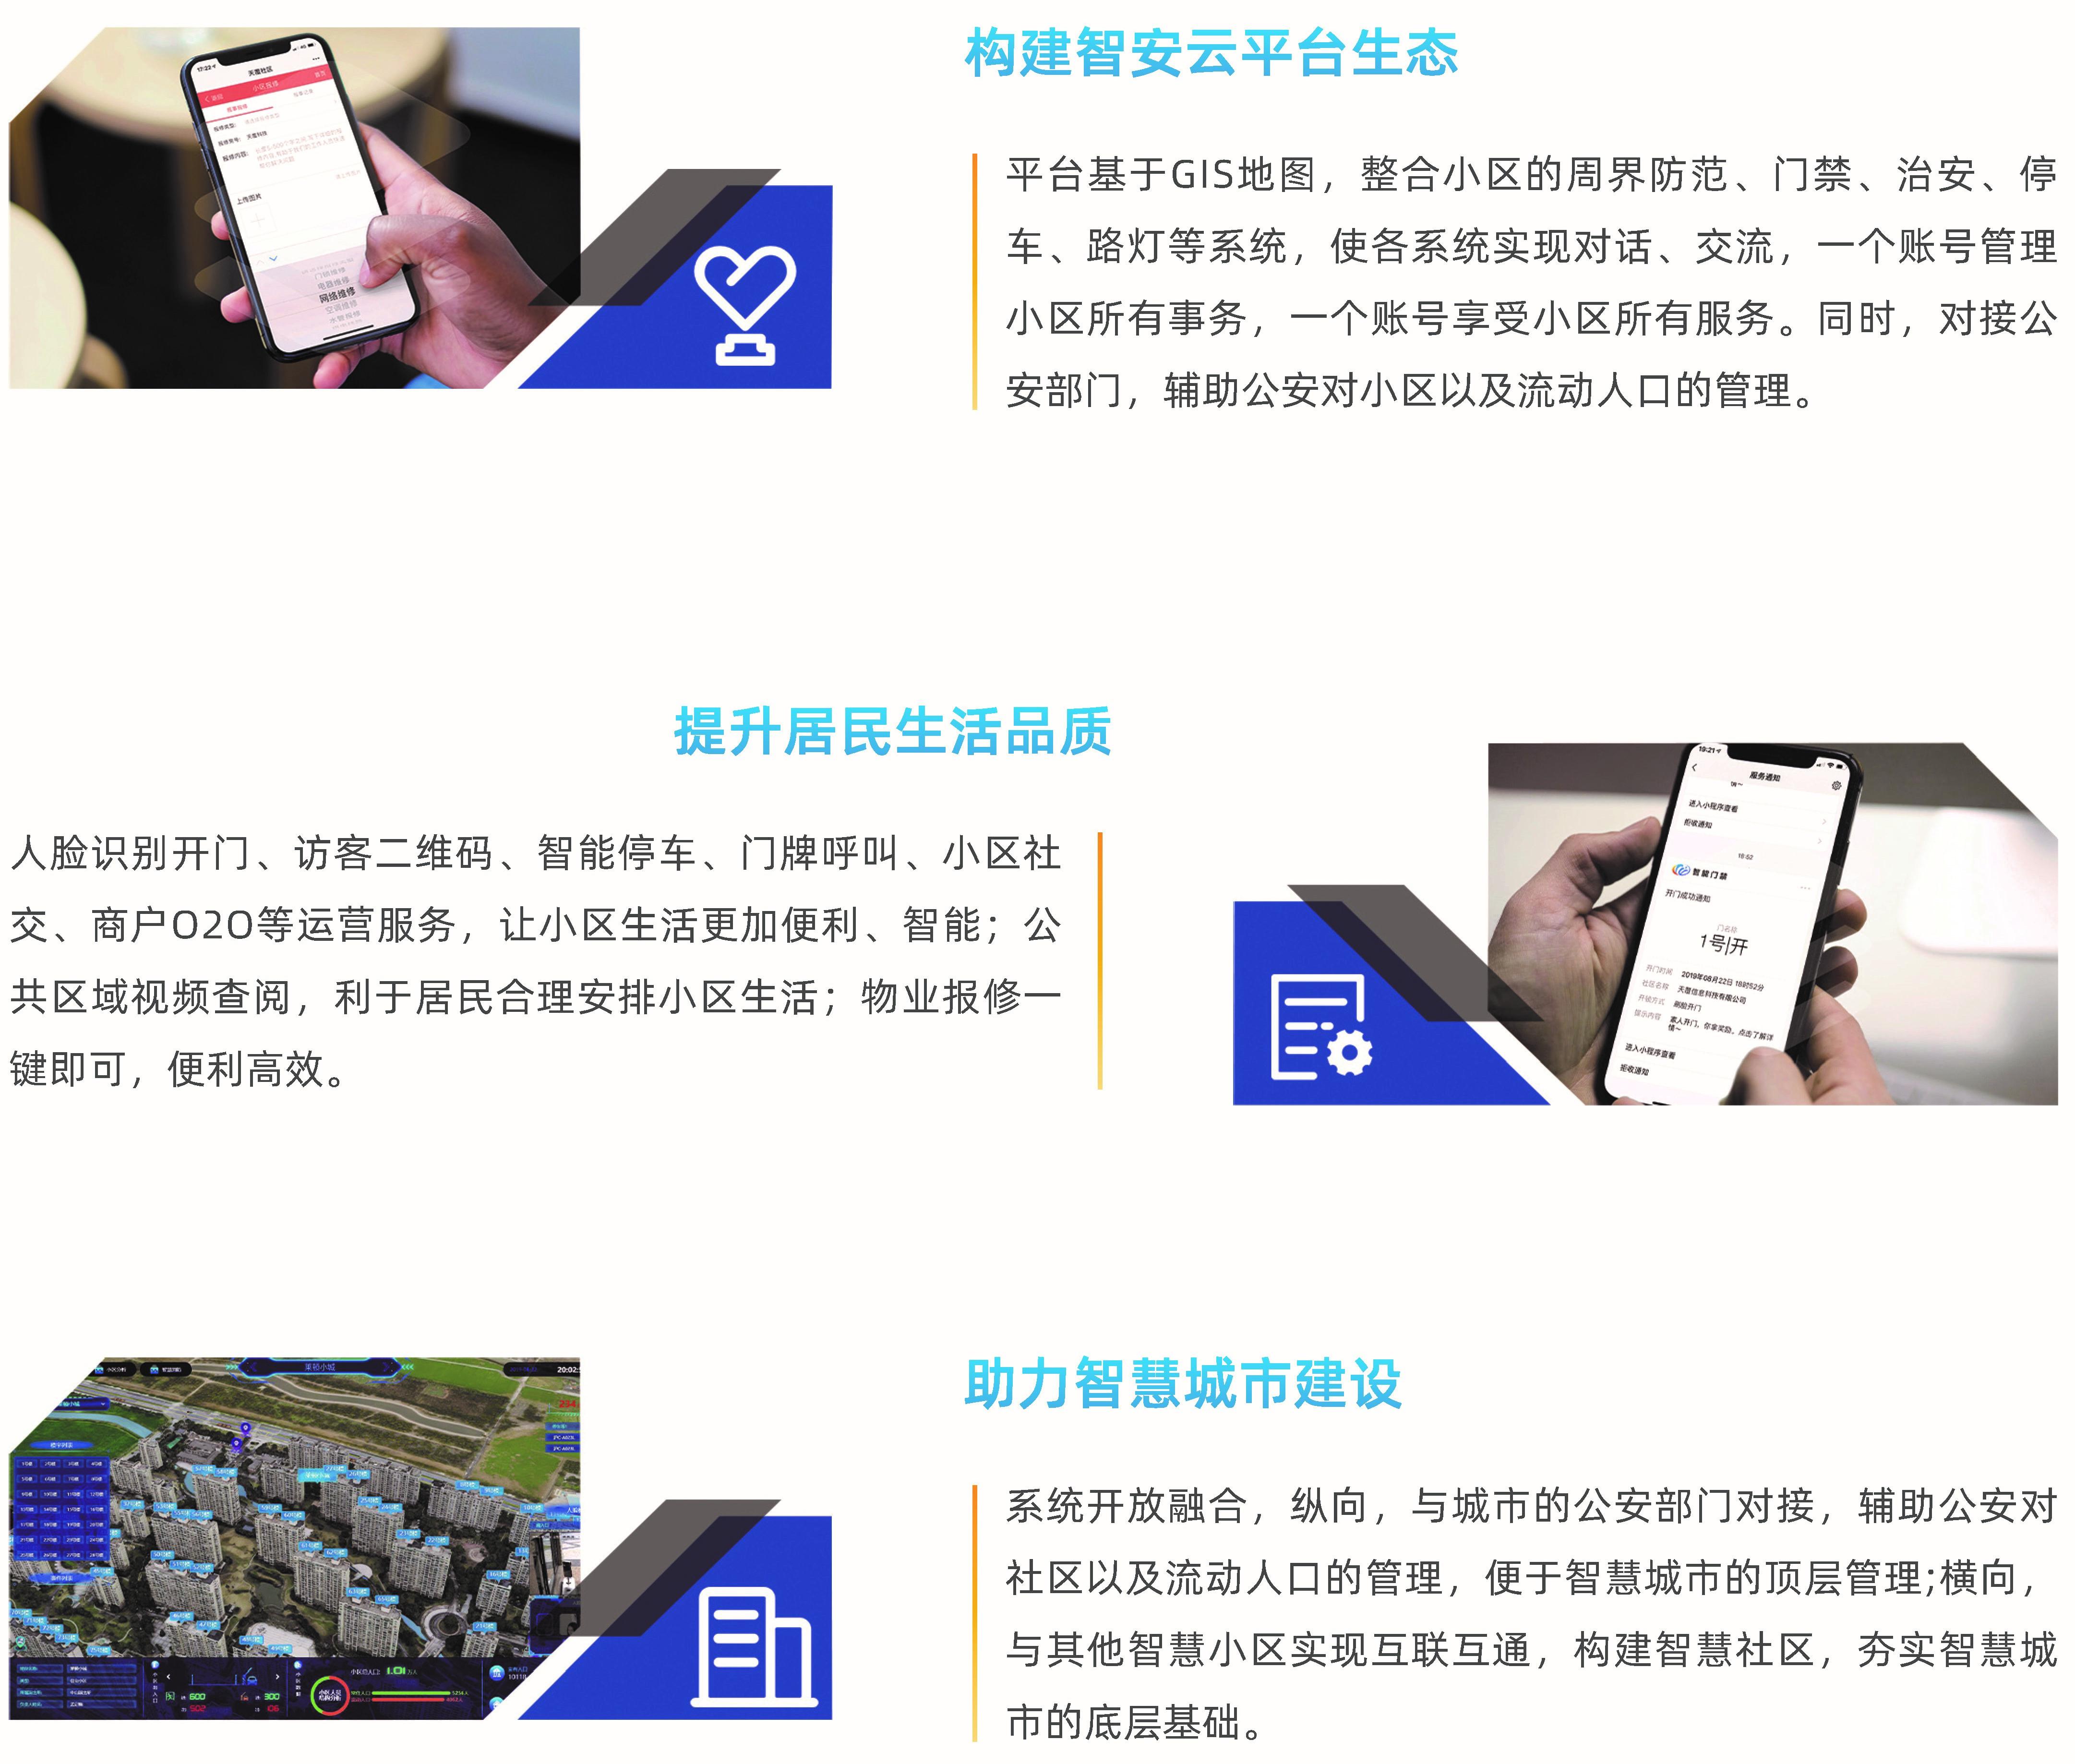 services-details-14.jpg